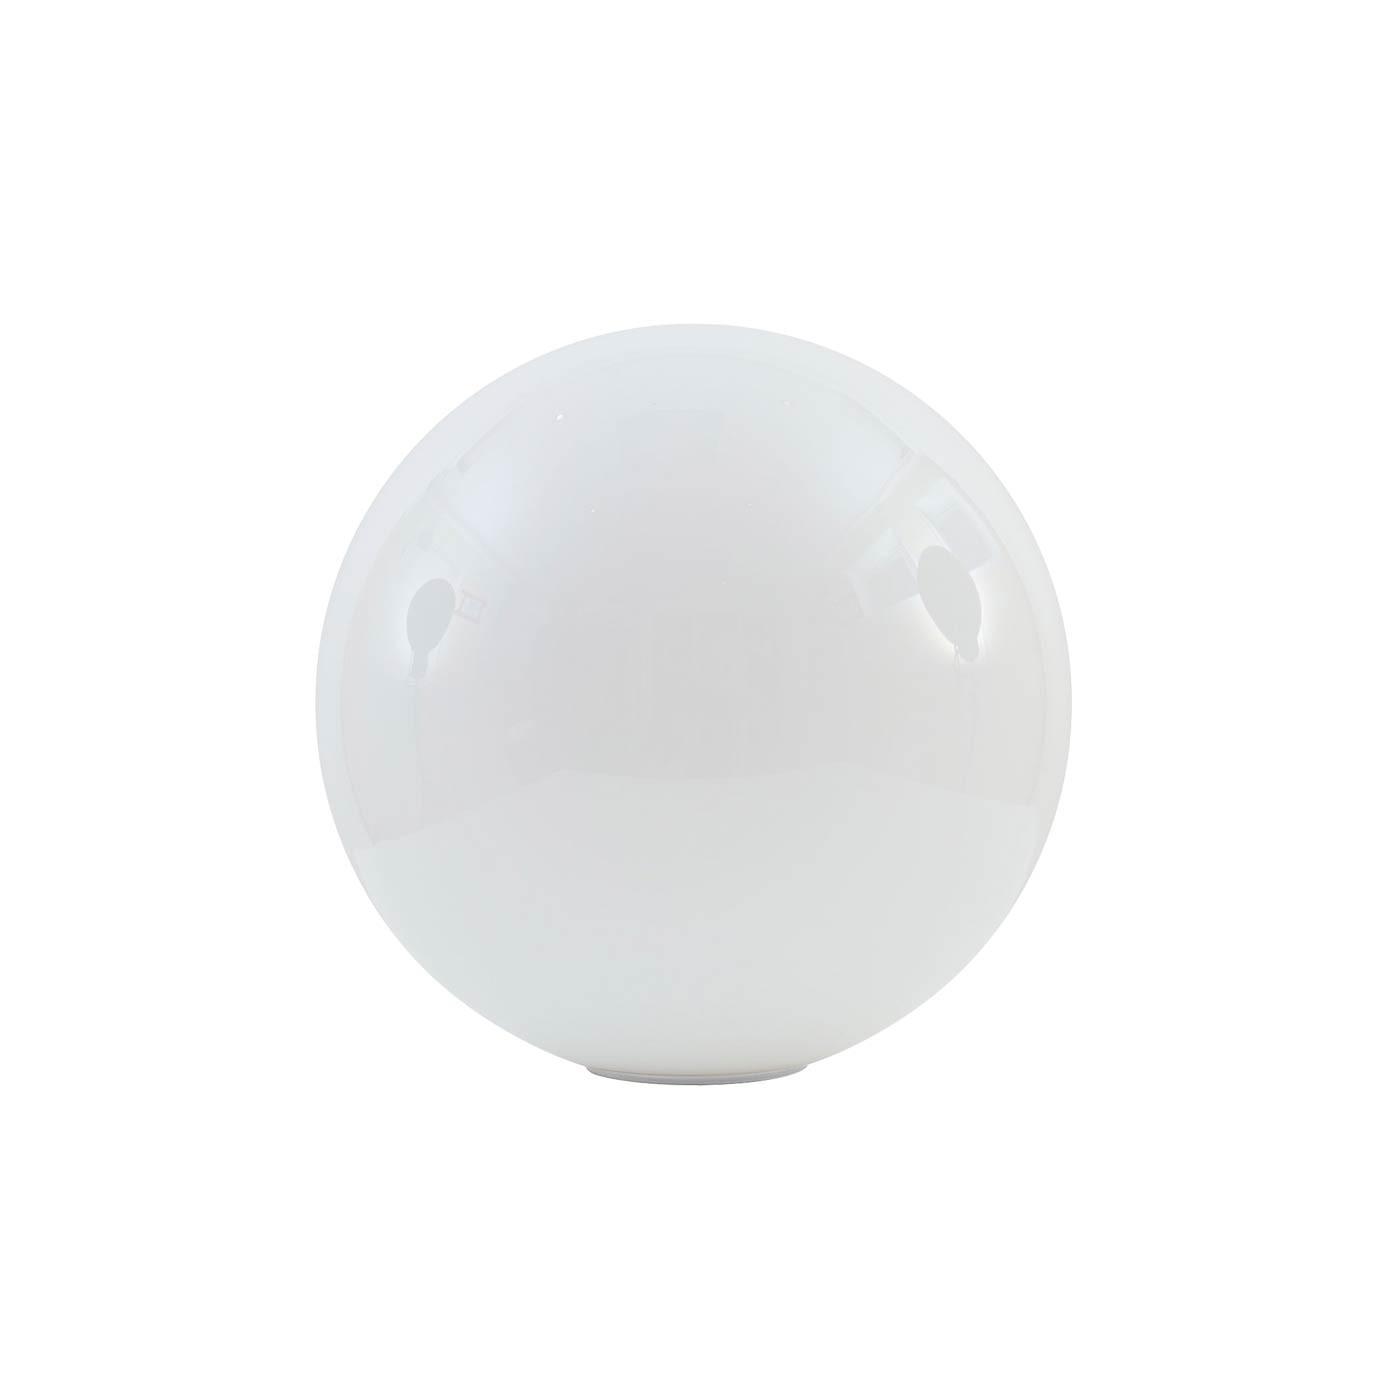 Flos IC Light C/W1, F1, S1 oder T1 Ersatzglaskugel